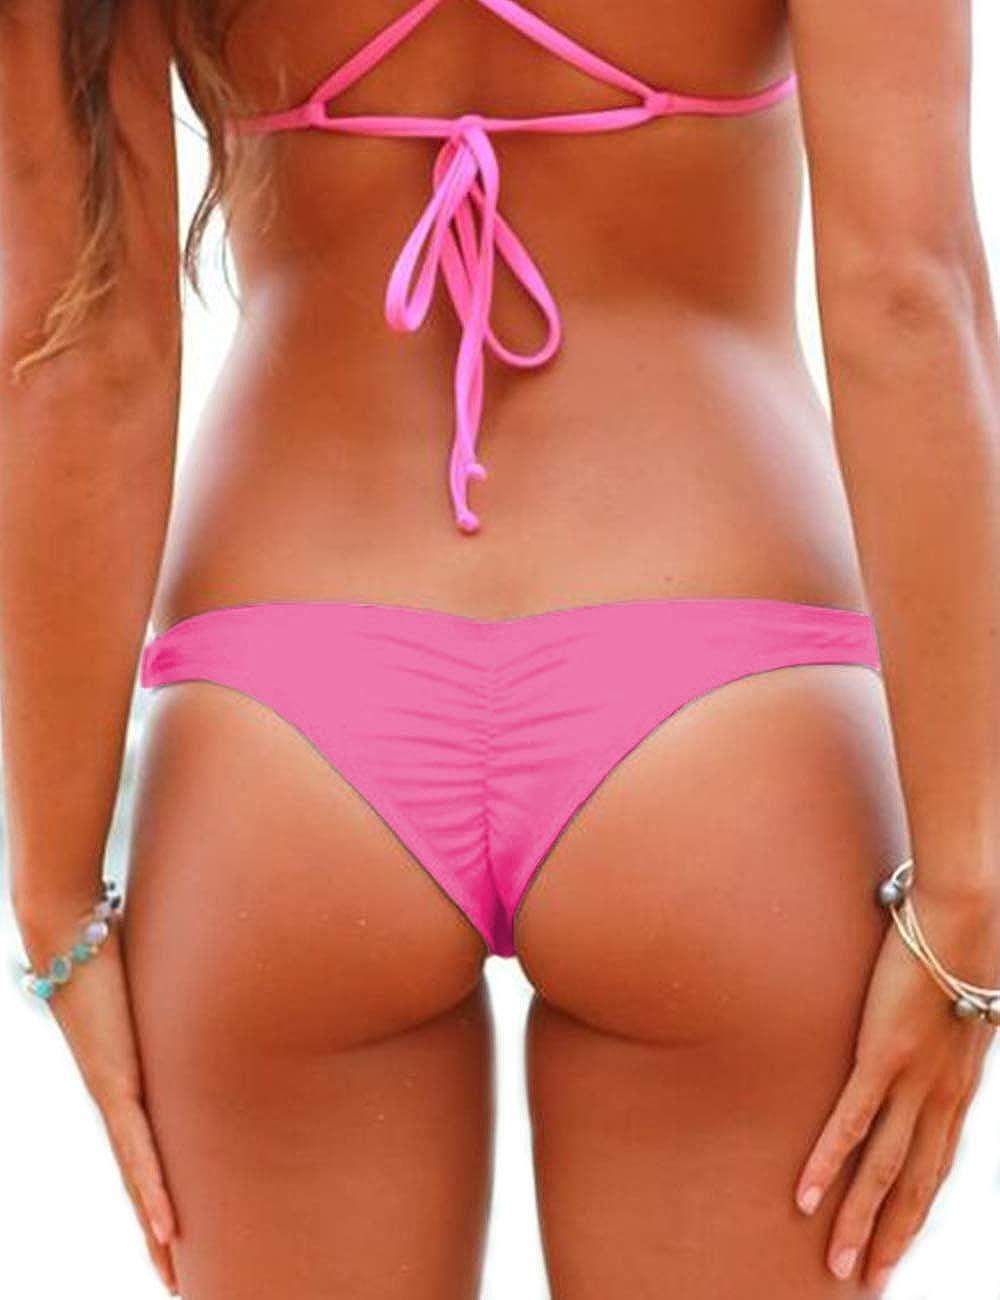 CROSS1946 Max 47% OFF Sexy Weekly update Women's Bikini Thong Ru Brazilian V Bottom Cheeky